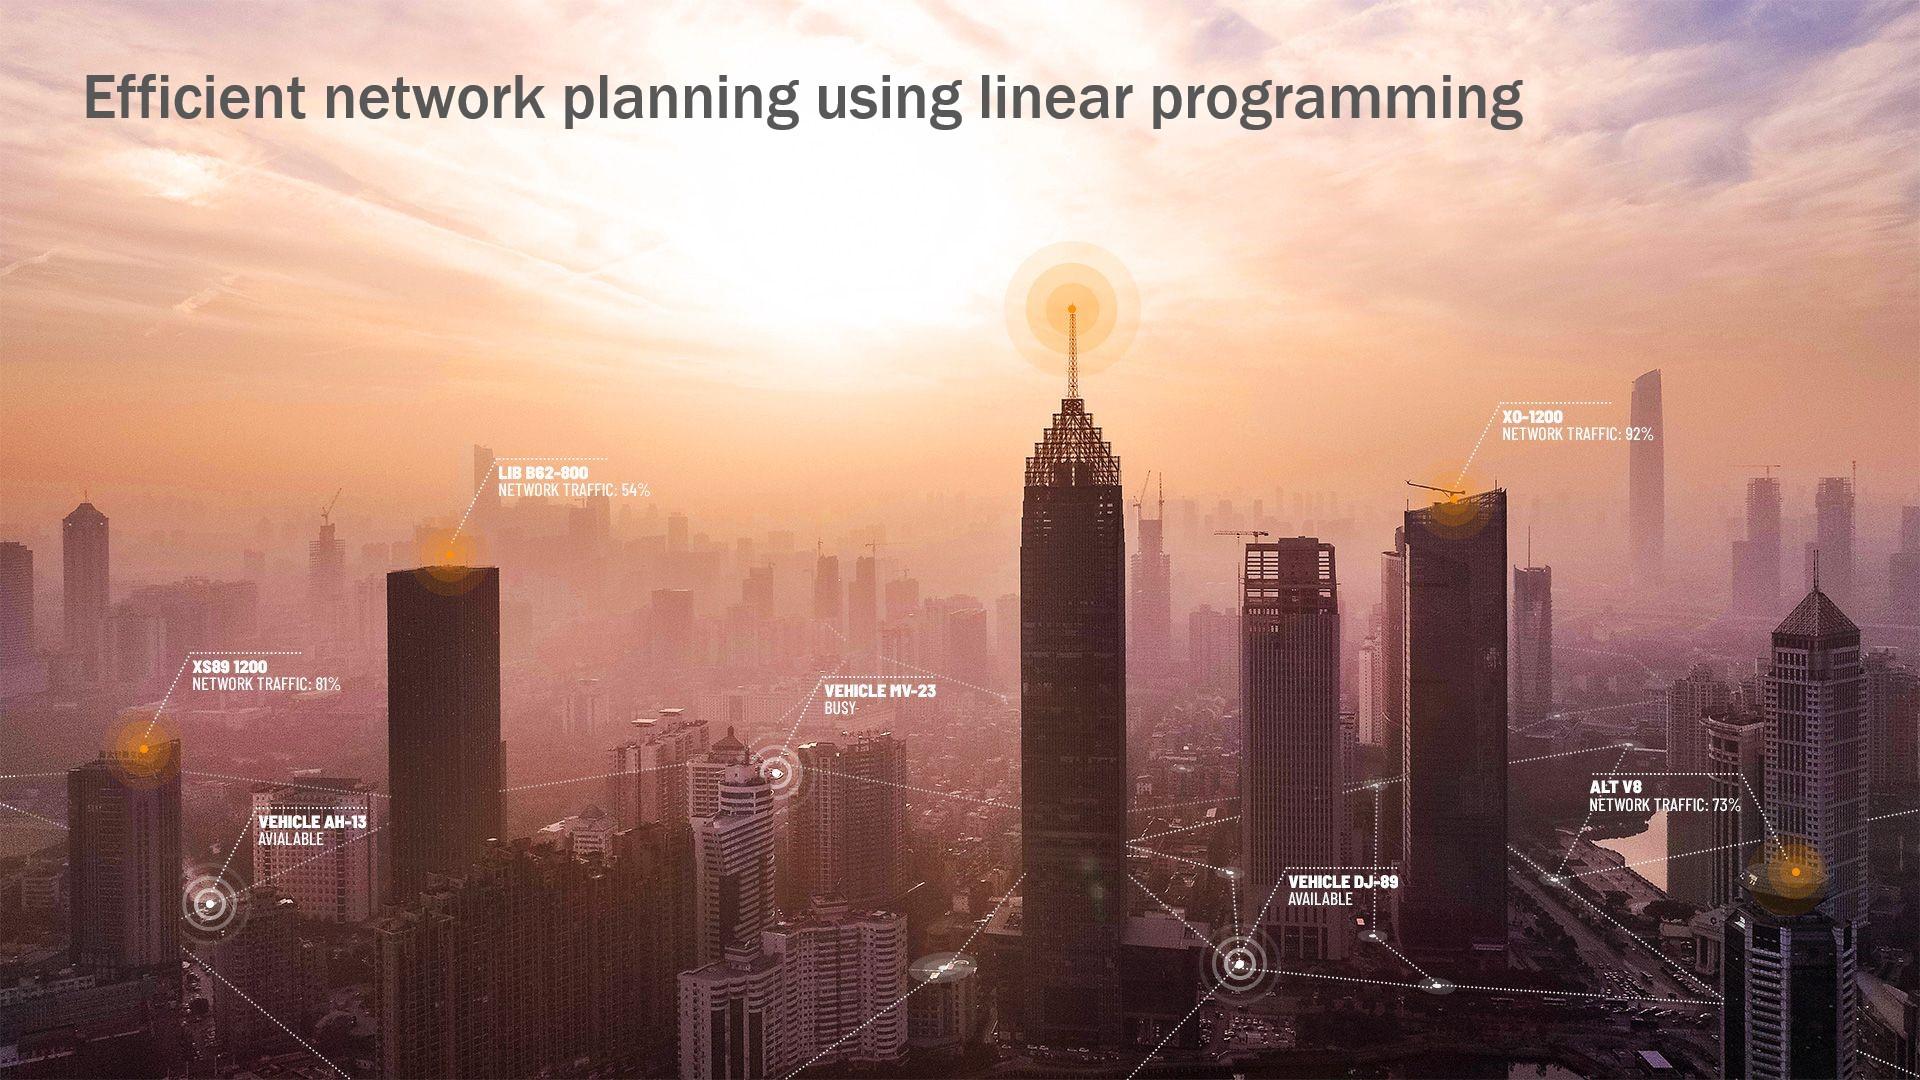 Webinar on efficient cellular network planning